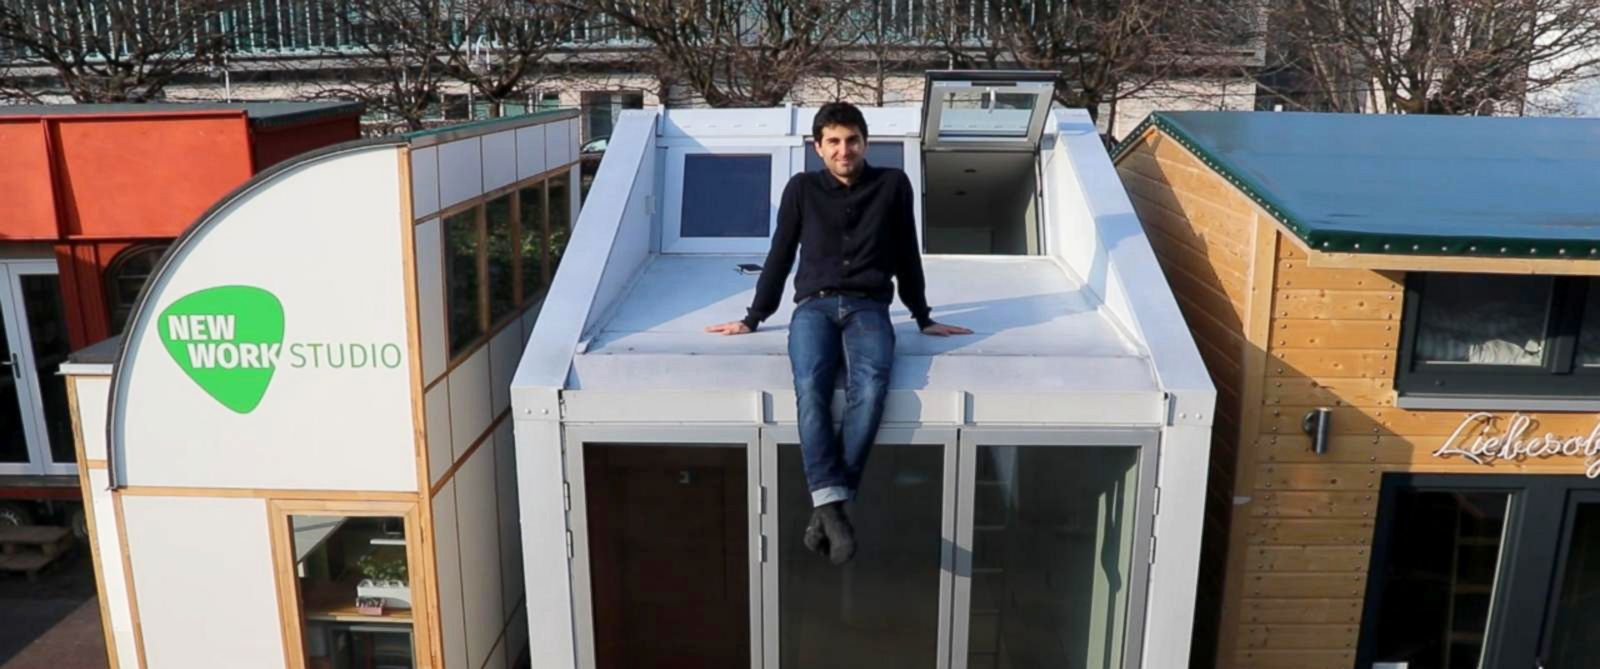 'PHOTO: Inside architect Leonardo Di Chiara's tiny home.' from the web at 'https://s.abcnews.com/images/International/leonardo-ci-chiara-tiny-house-01-abc-jef-180215_31x13_1600.jpg'